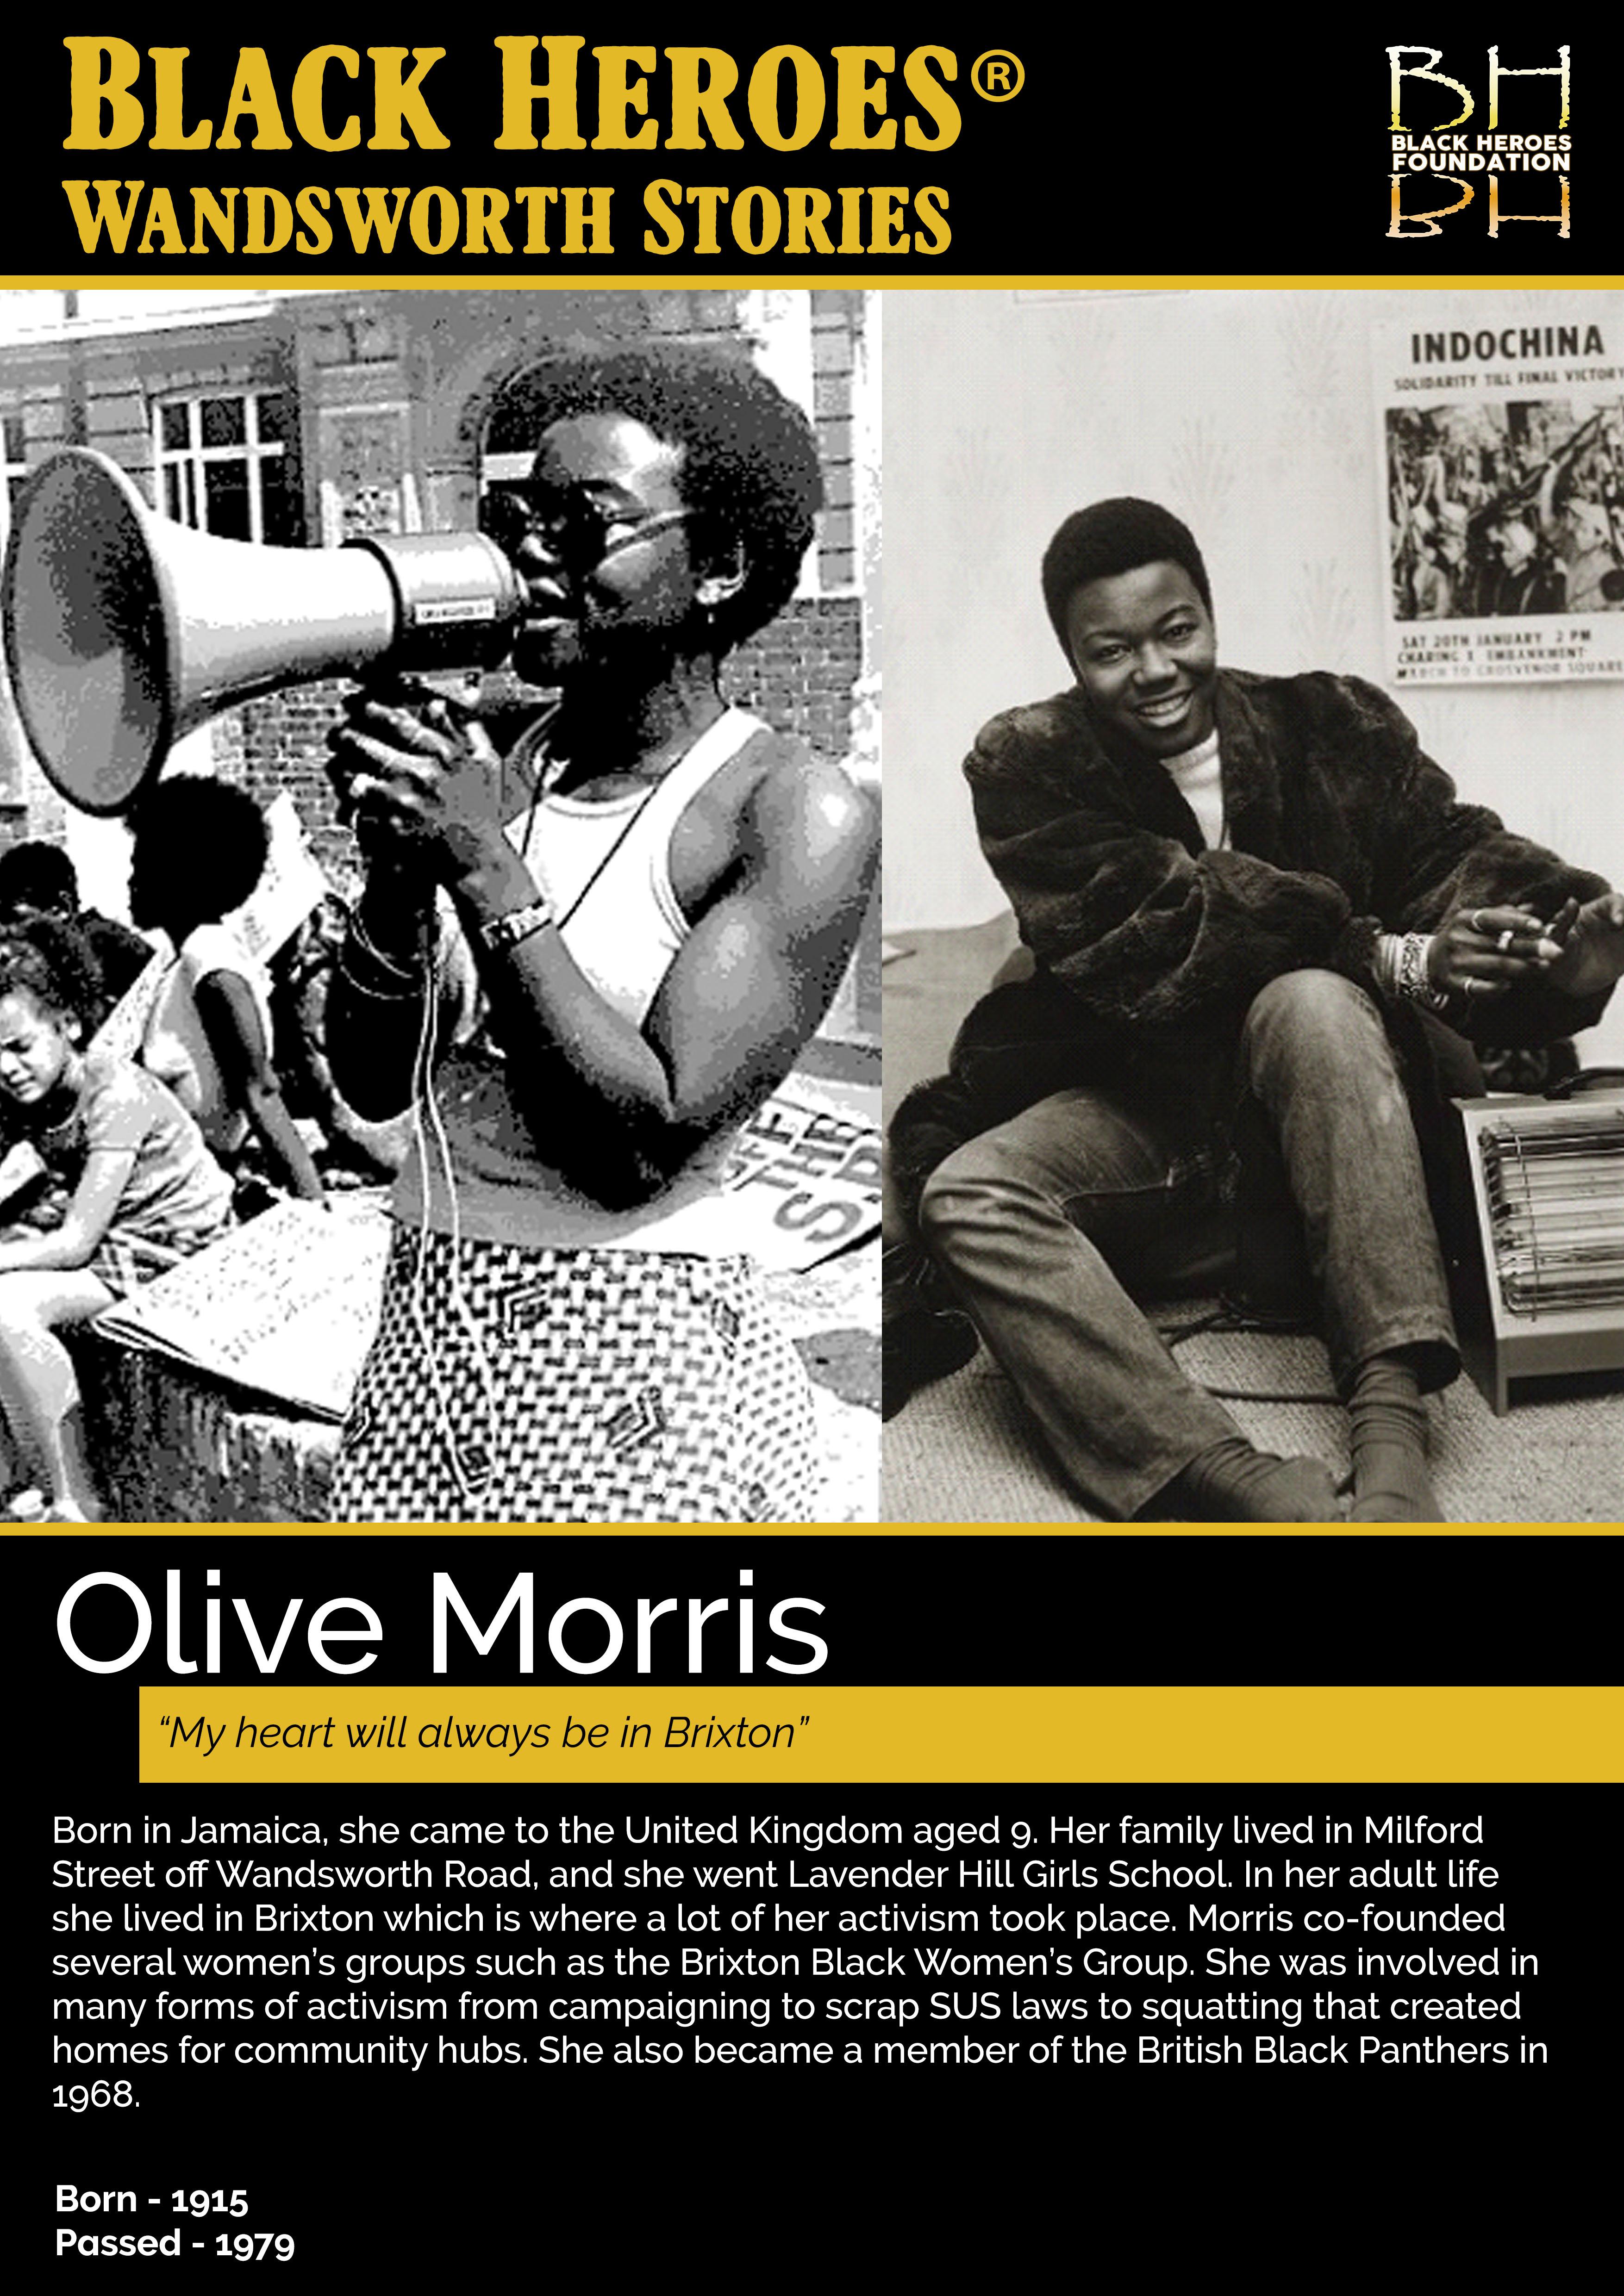 Olive Morris Wandsworth Stories